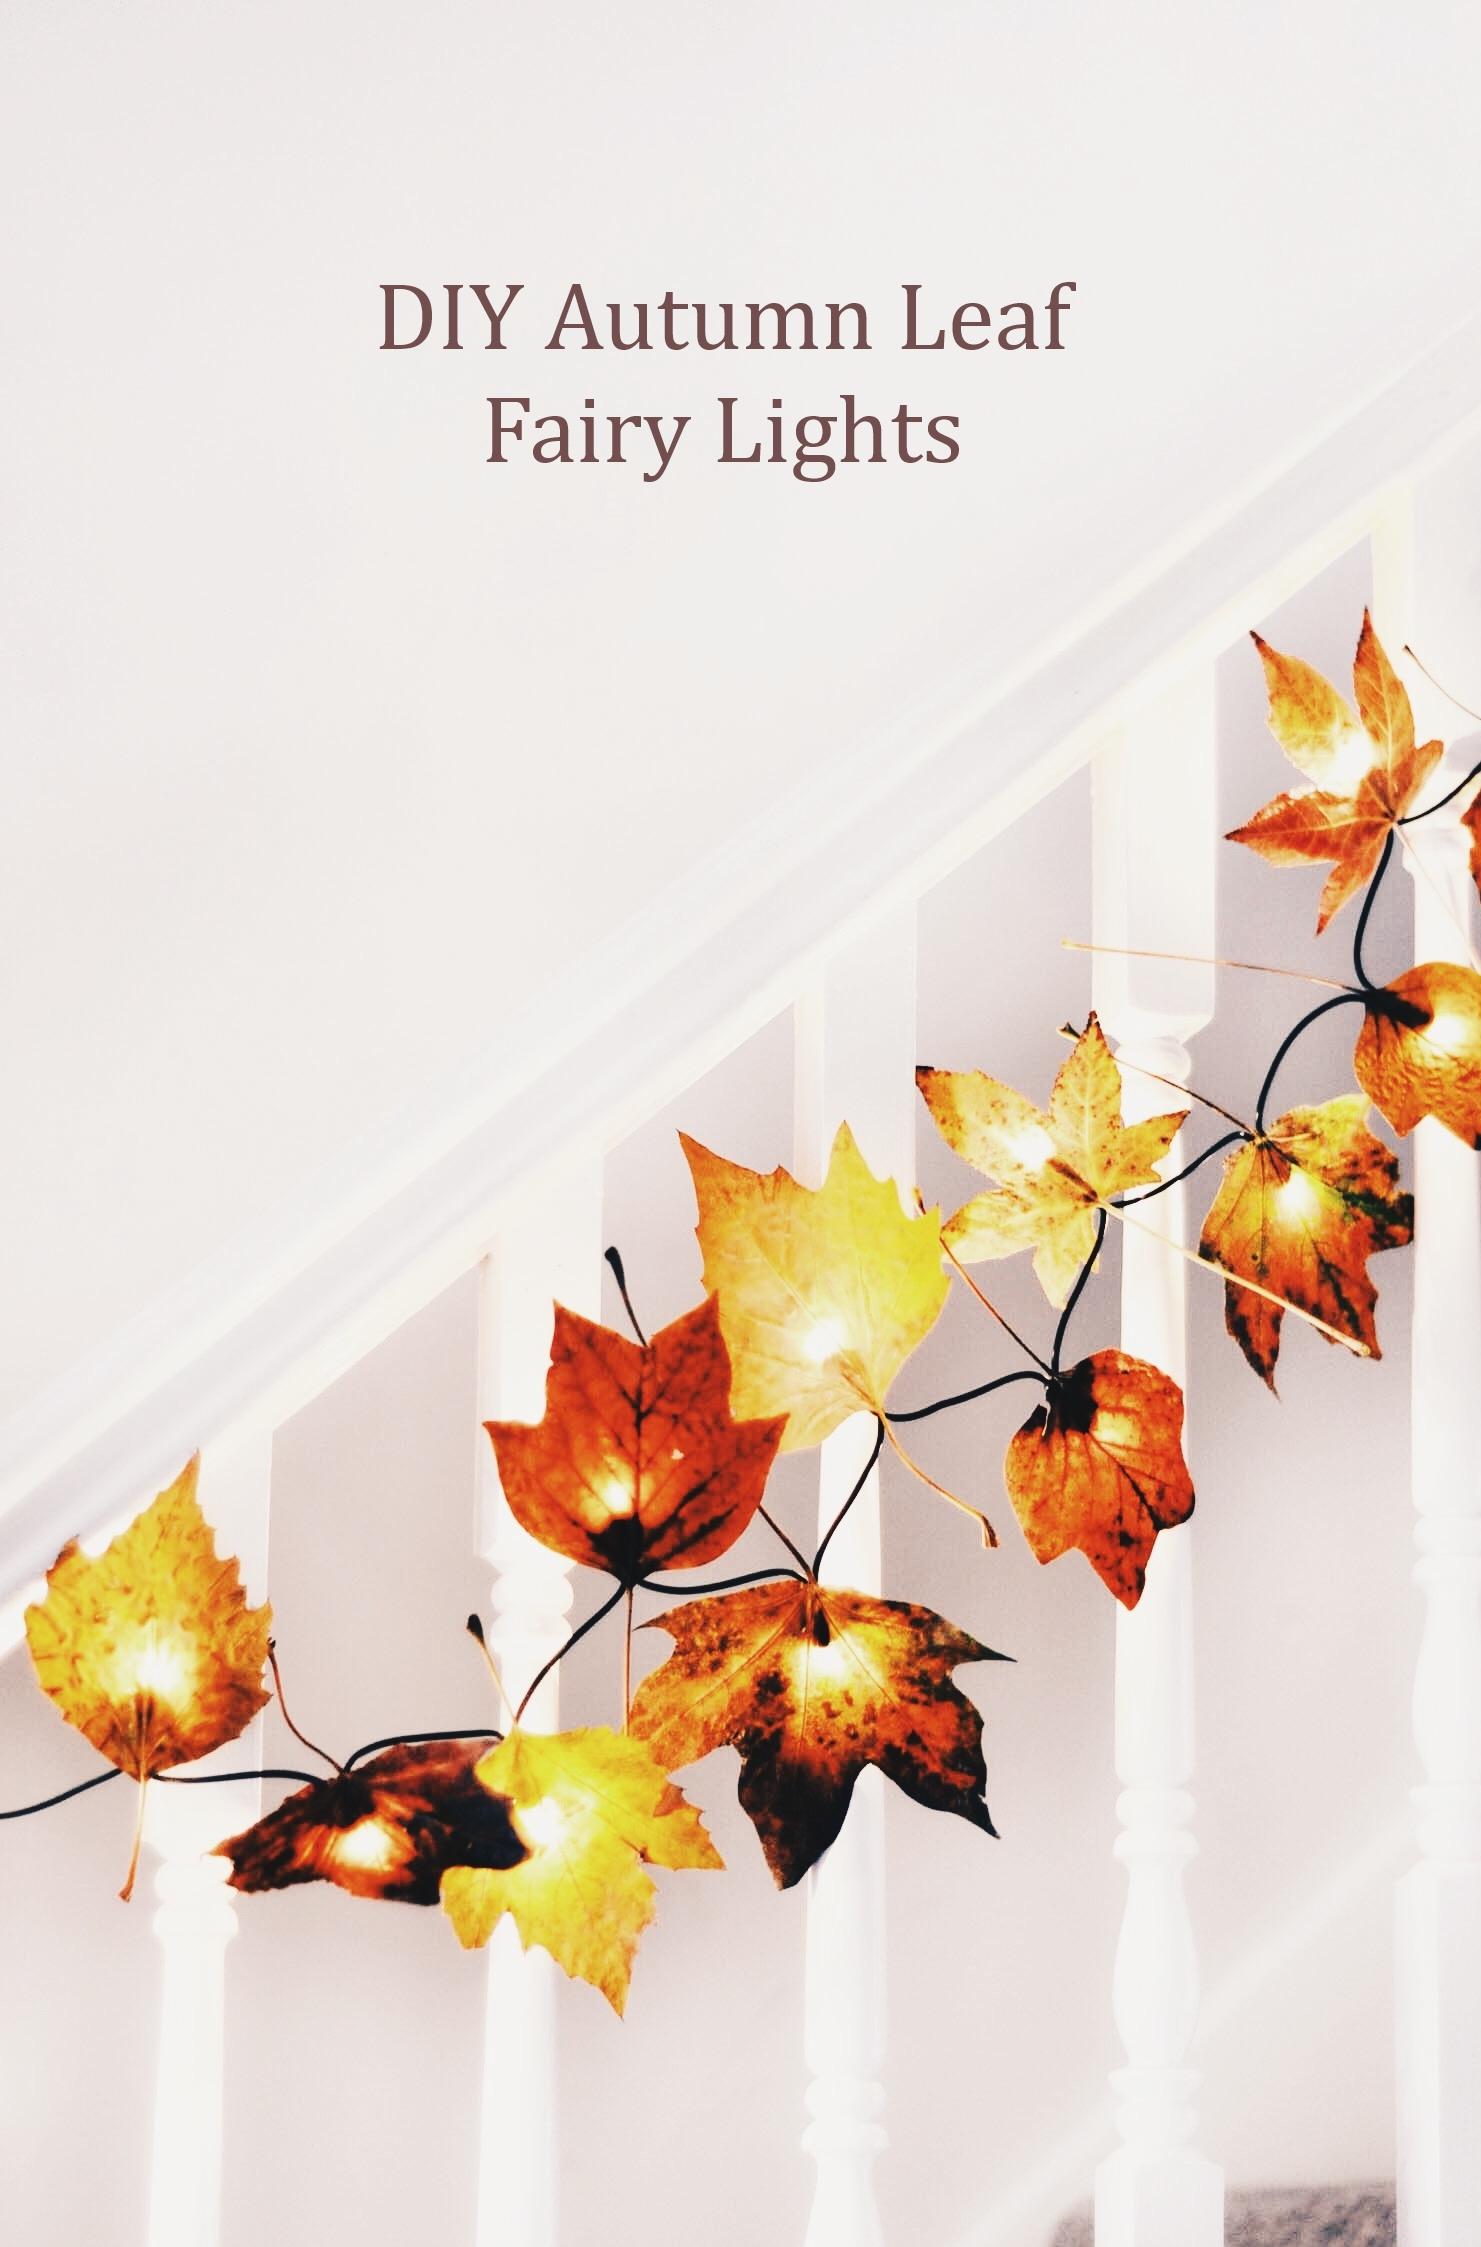 Diy autumn leaf fairy lights wallflower kitchen for Autumn leaf decoration